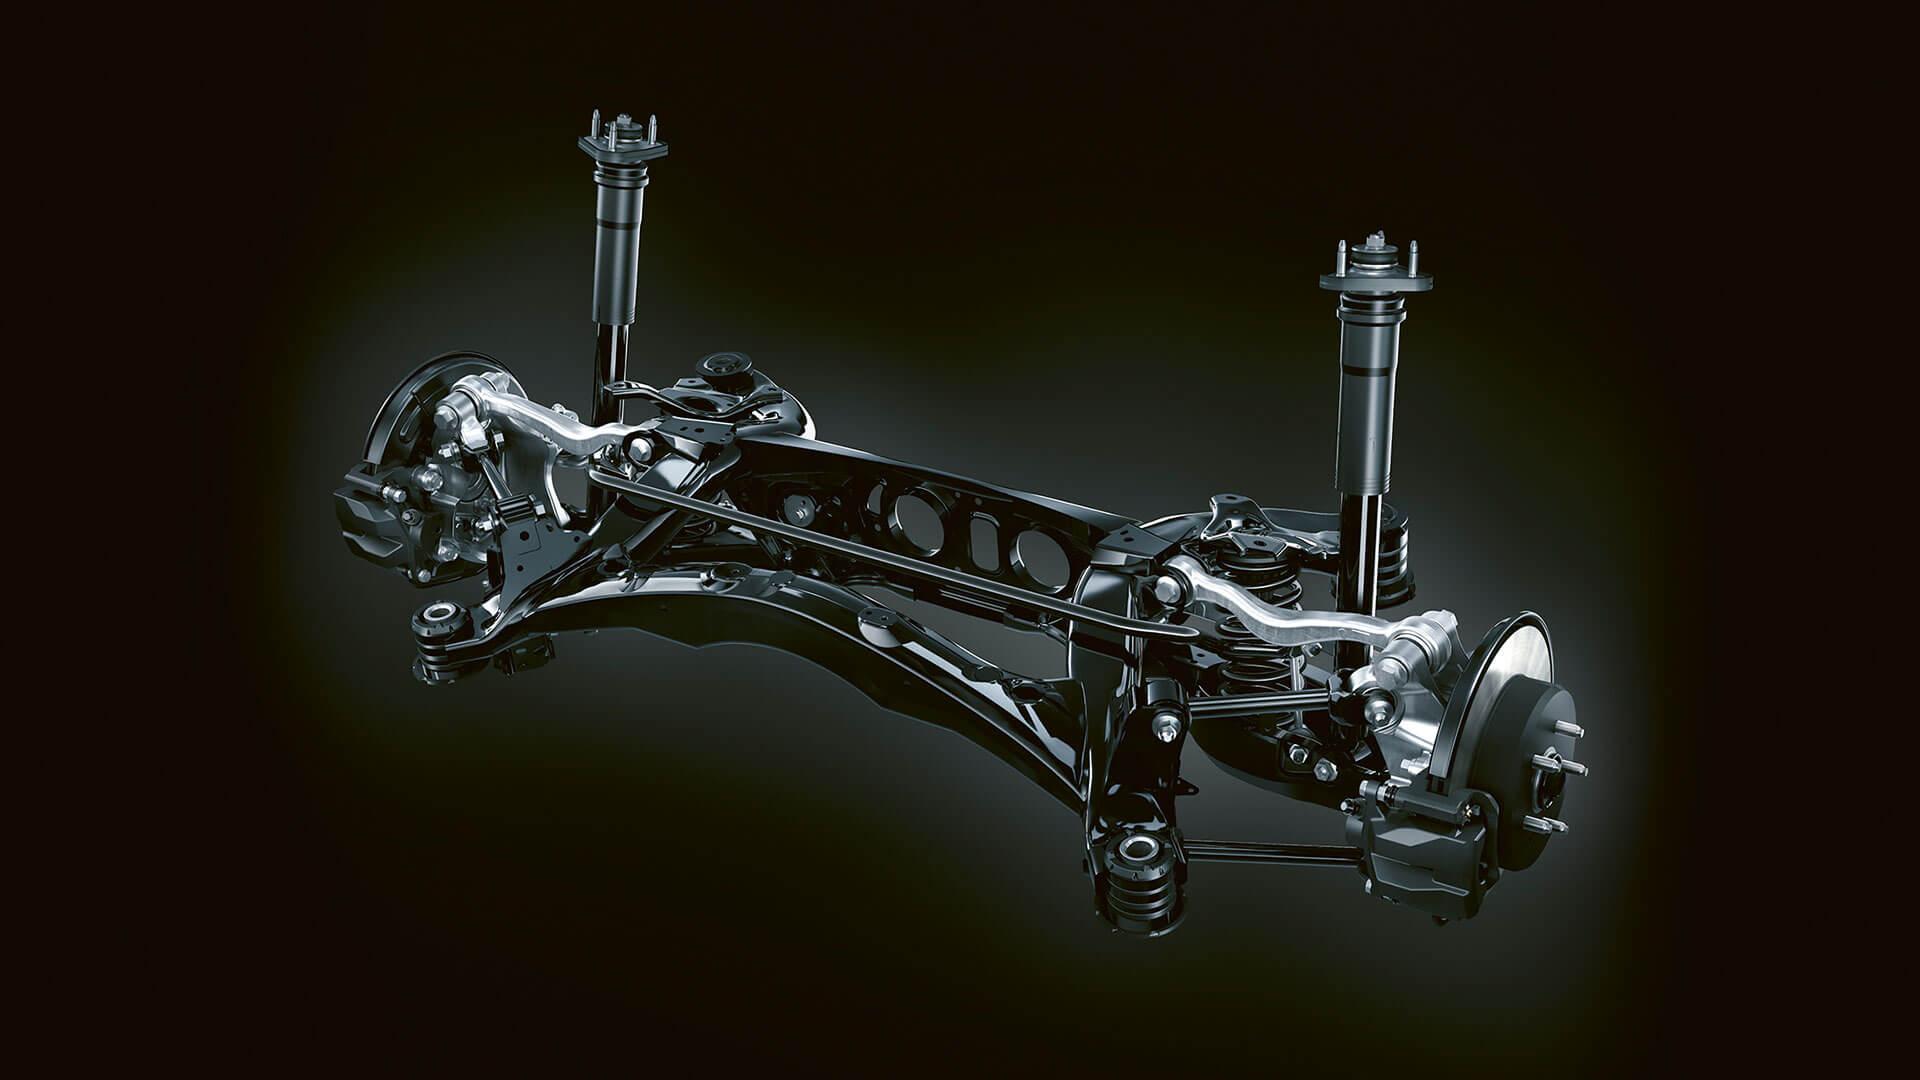 2018 lexus rc hotspot rear suspension